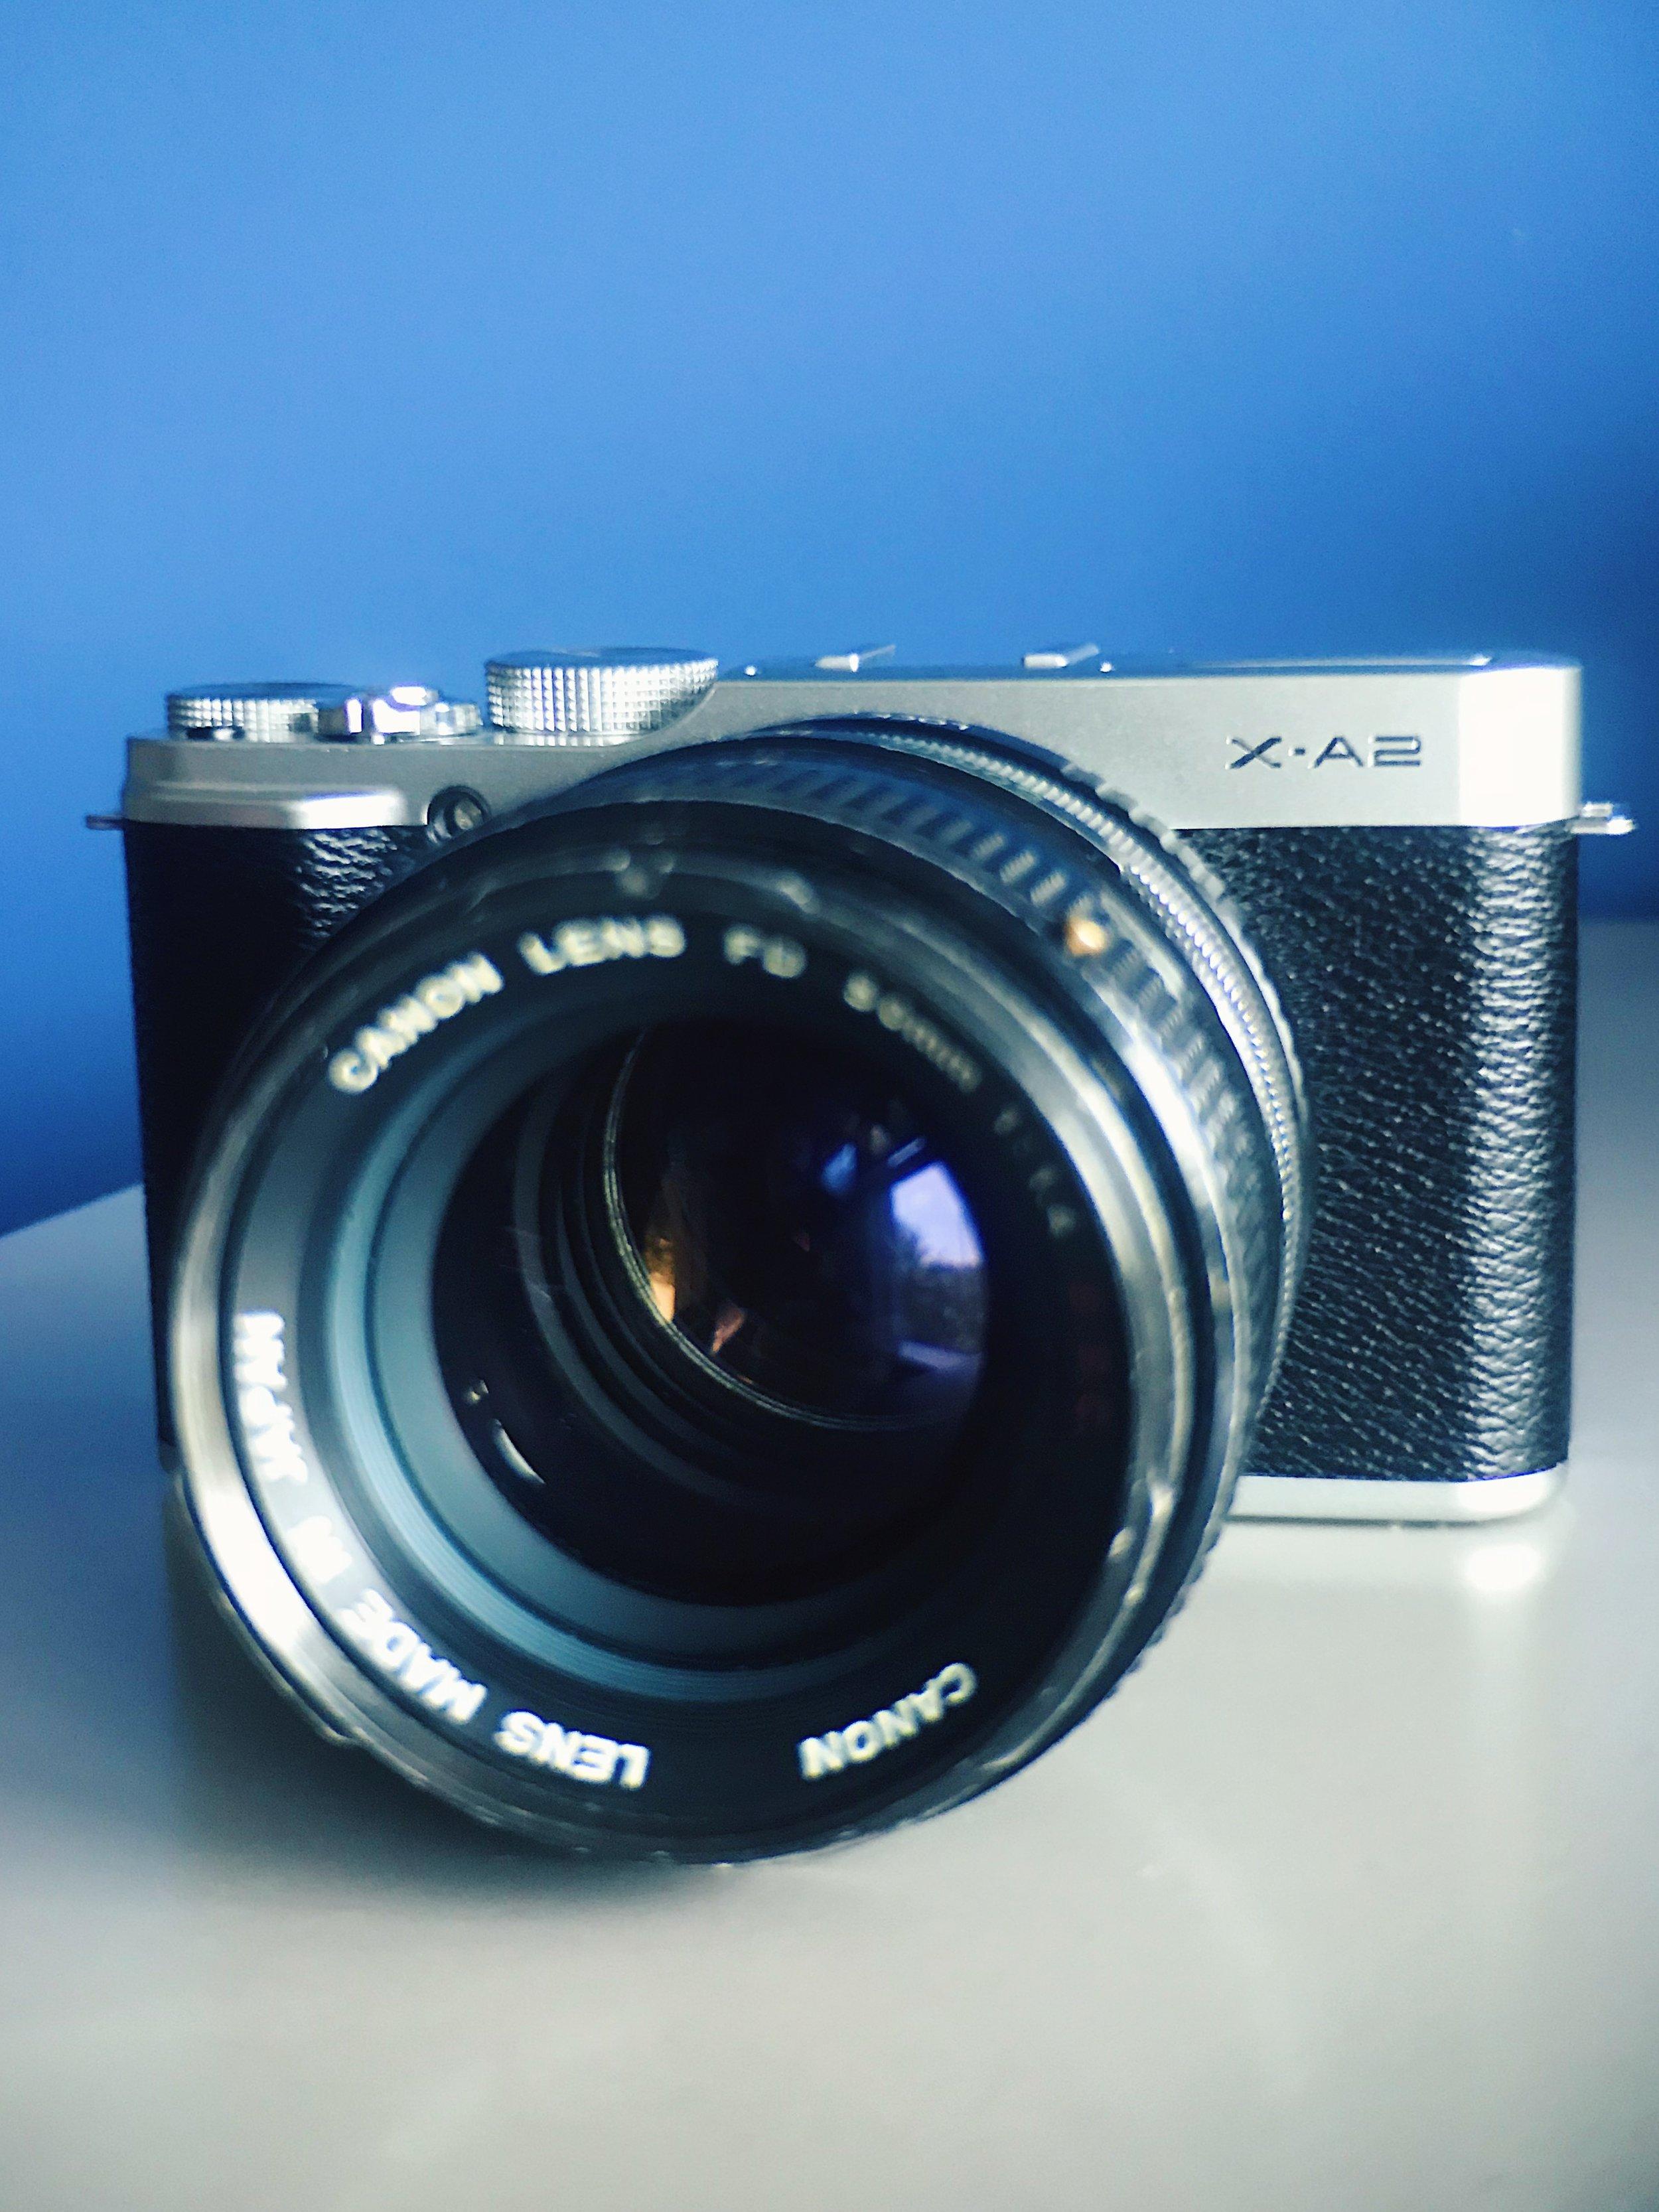 FUJI X-A2 Mirrorless Camera